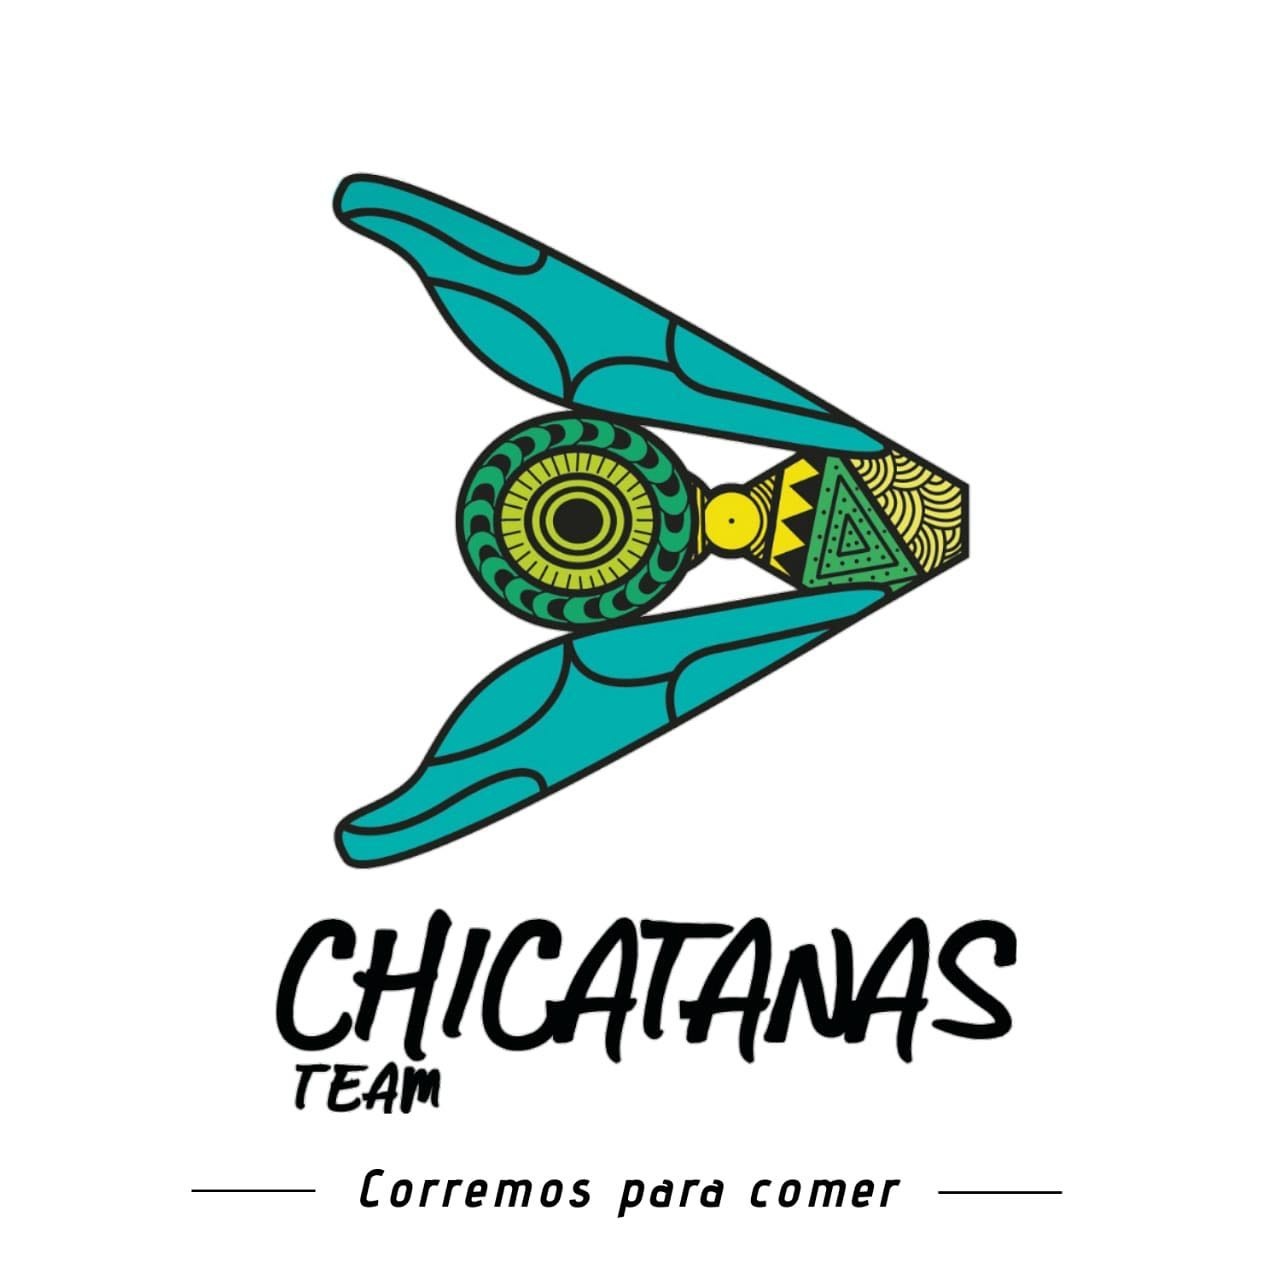 Chicatanas Team